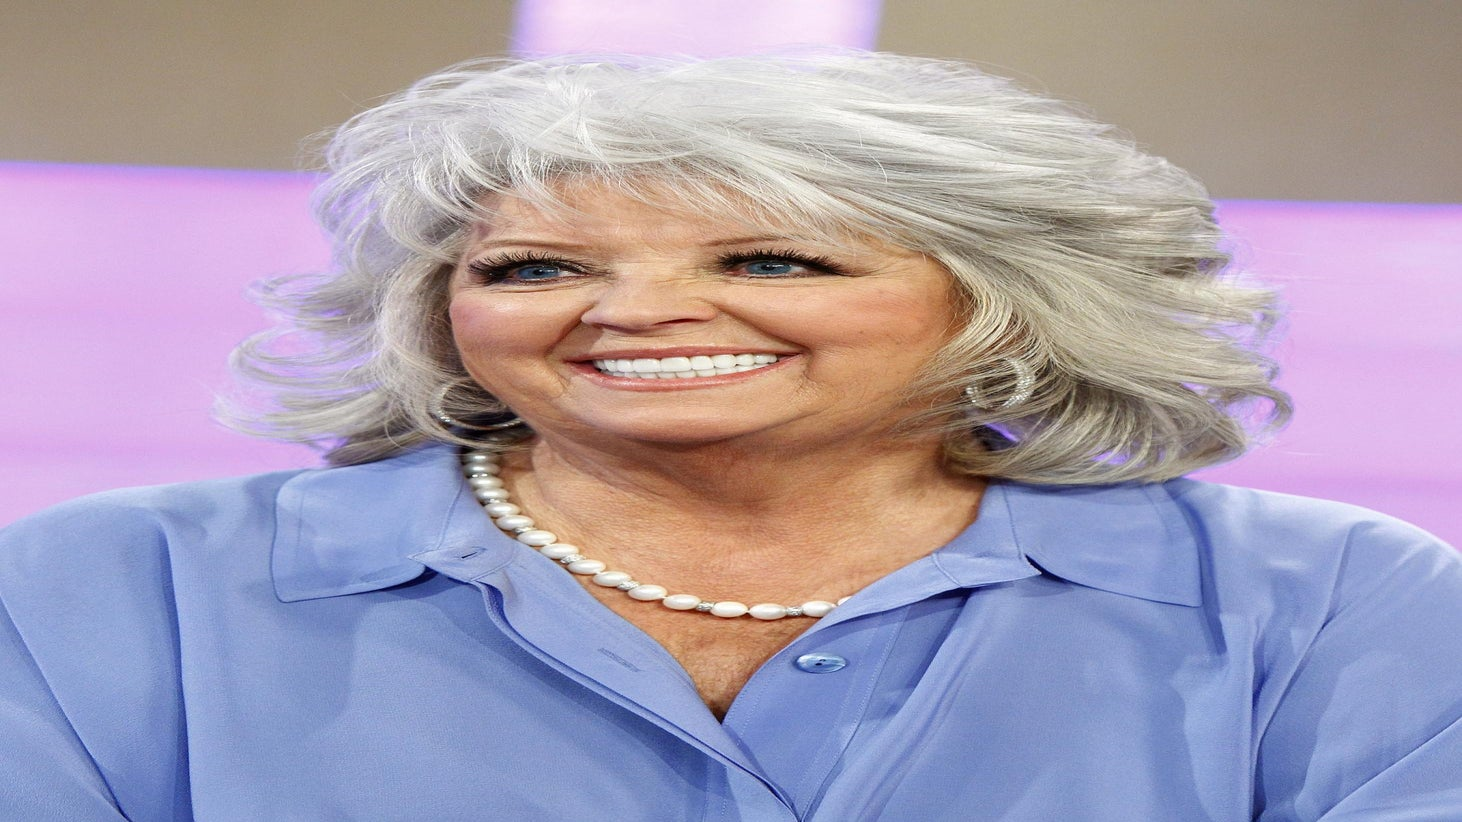 Paula Deen: 'I've Never Hurt Anybody on Purpose'